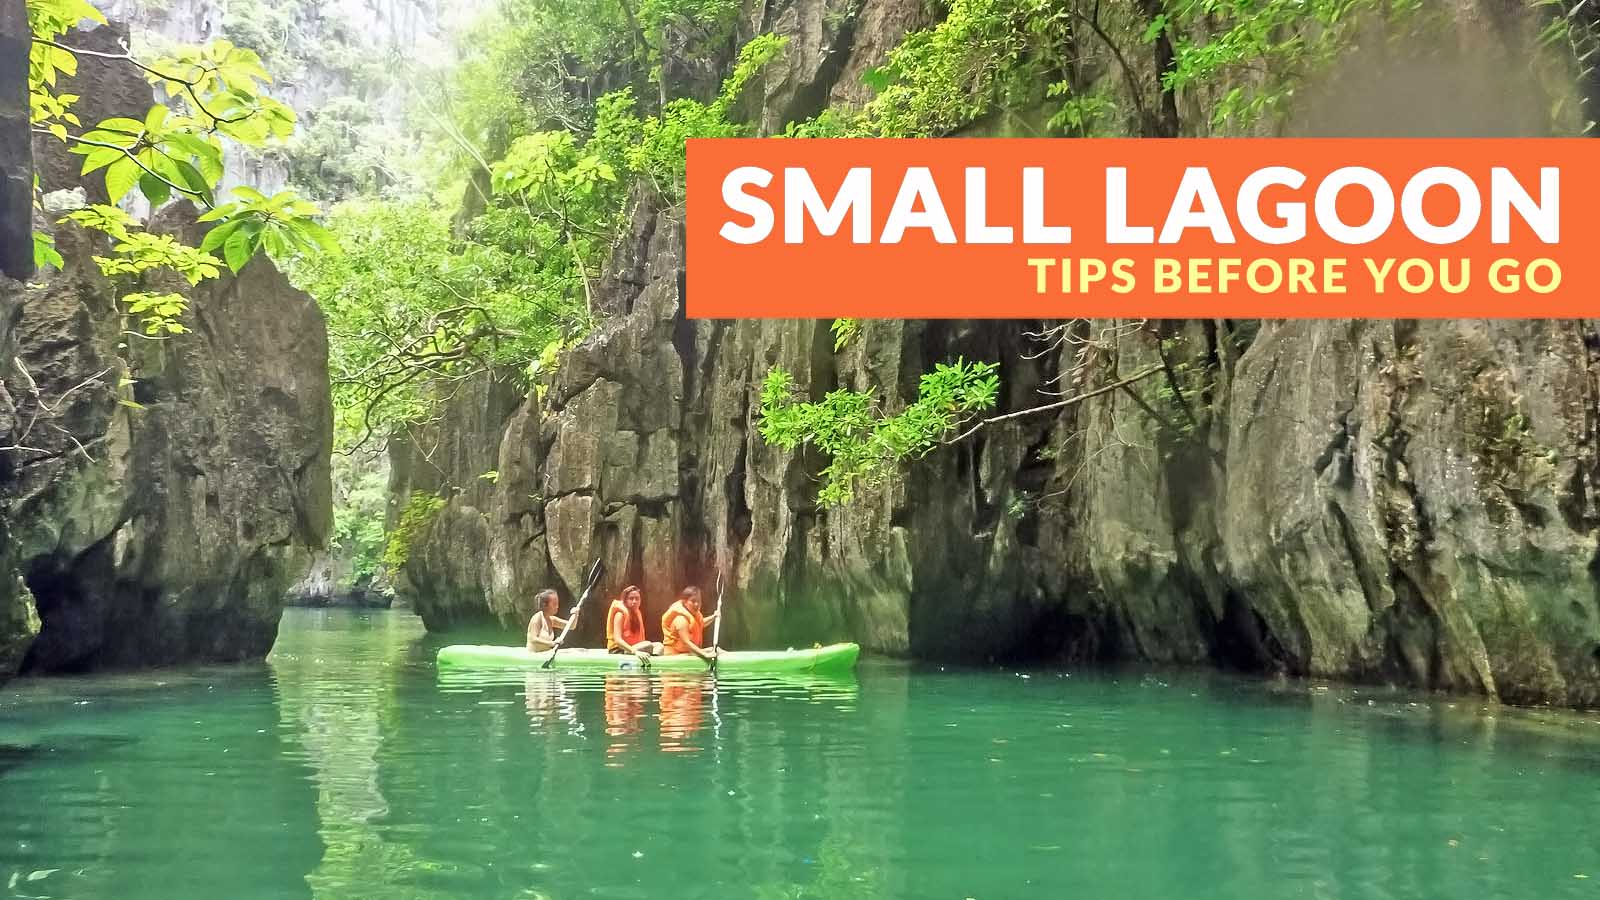 Small Lagoon El Nido Important Travel Tips Philippine